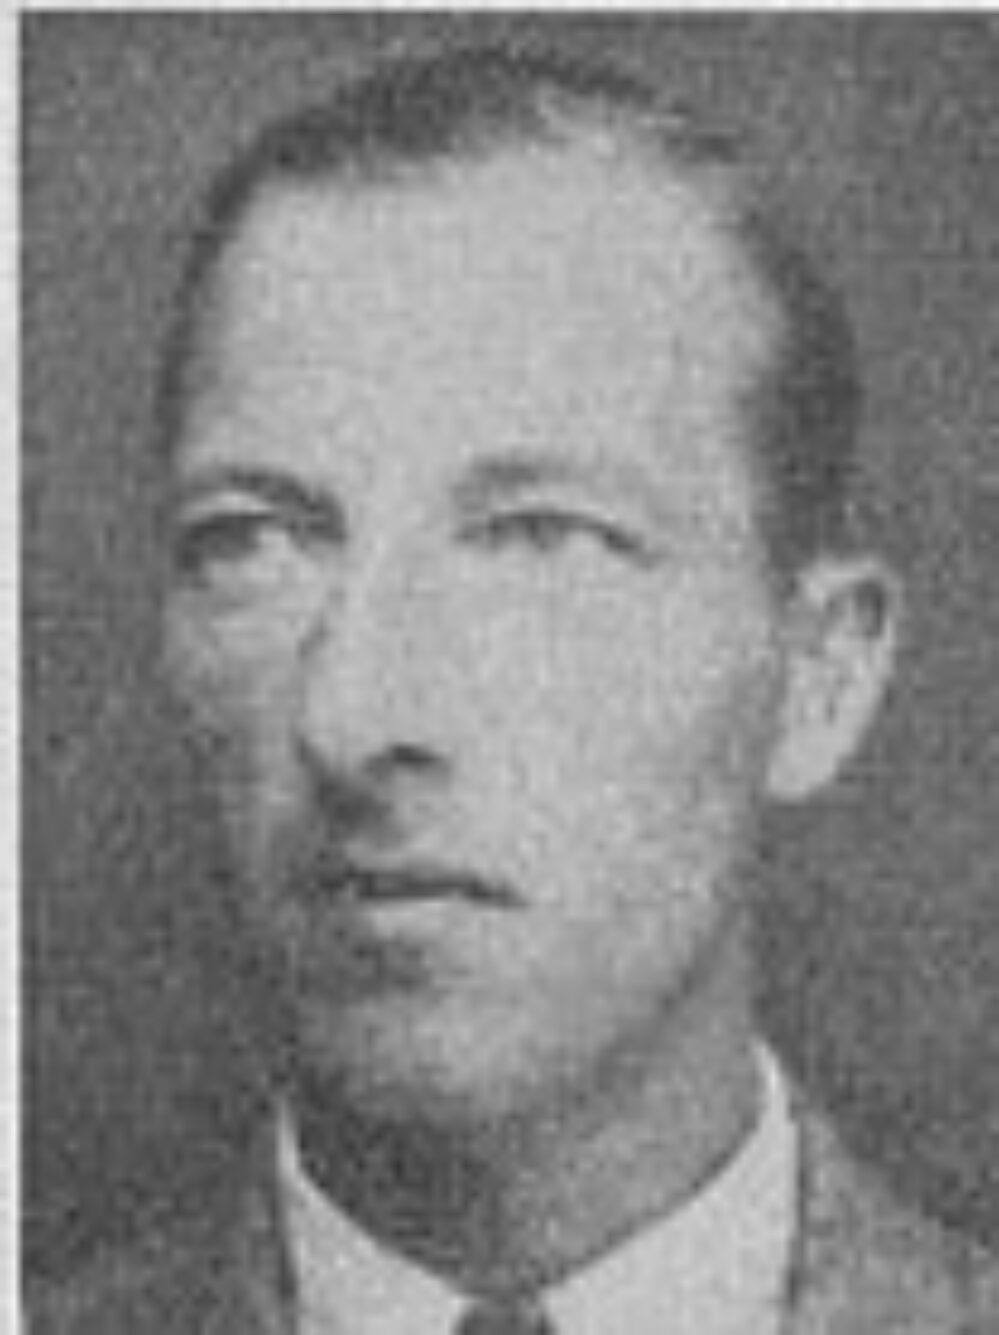 Lorentz Larsen